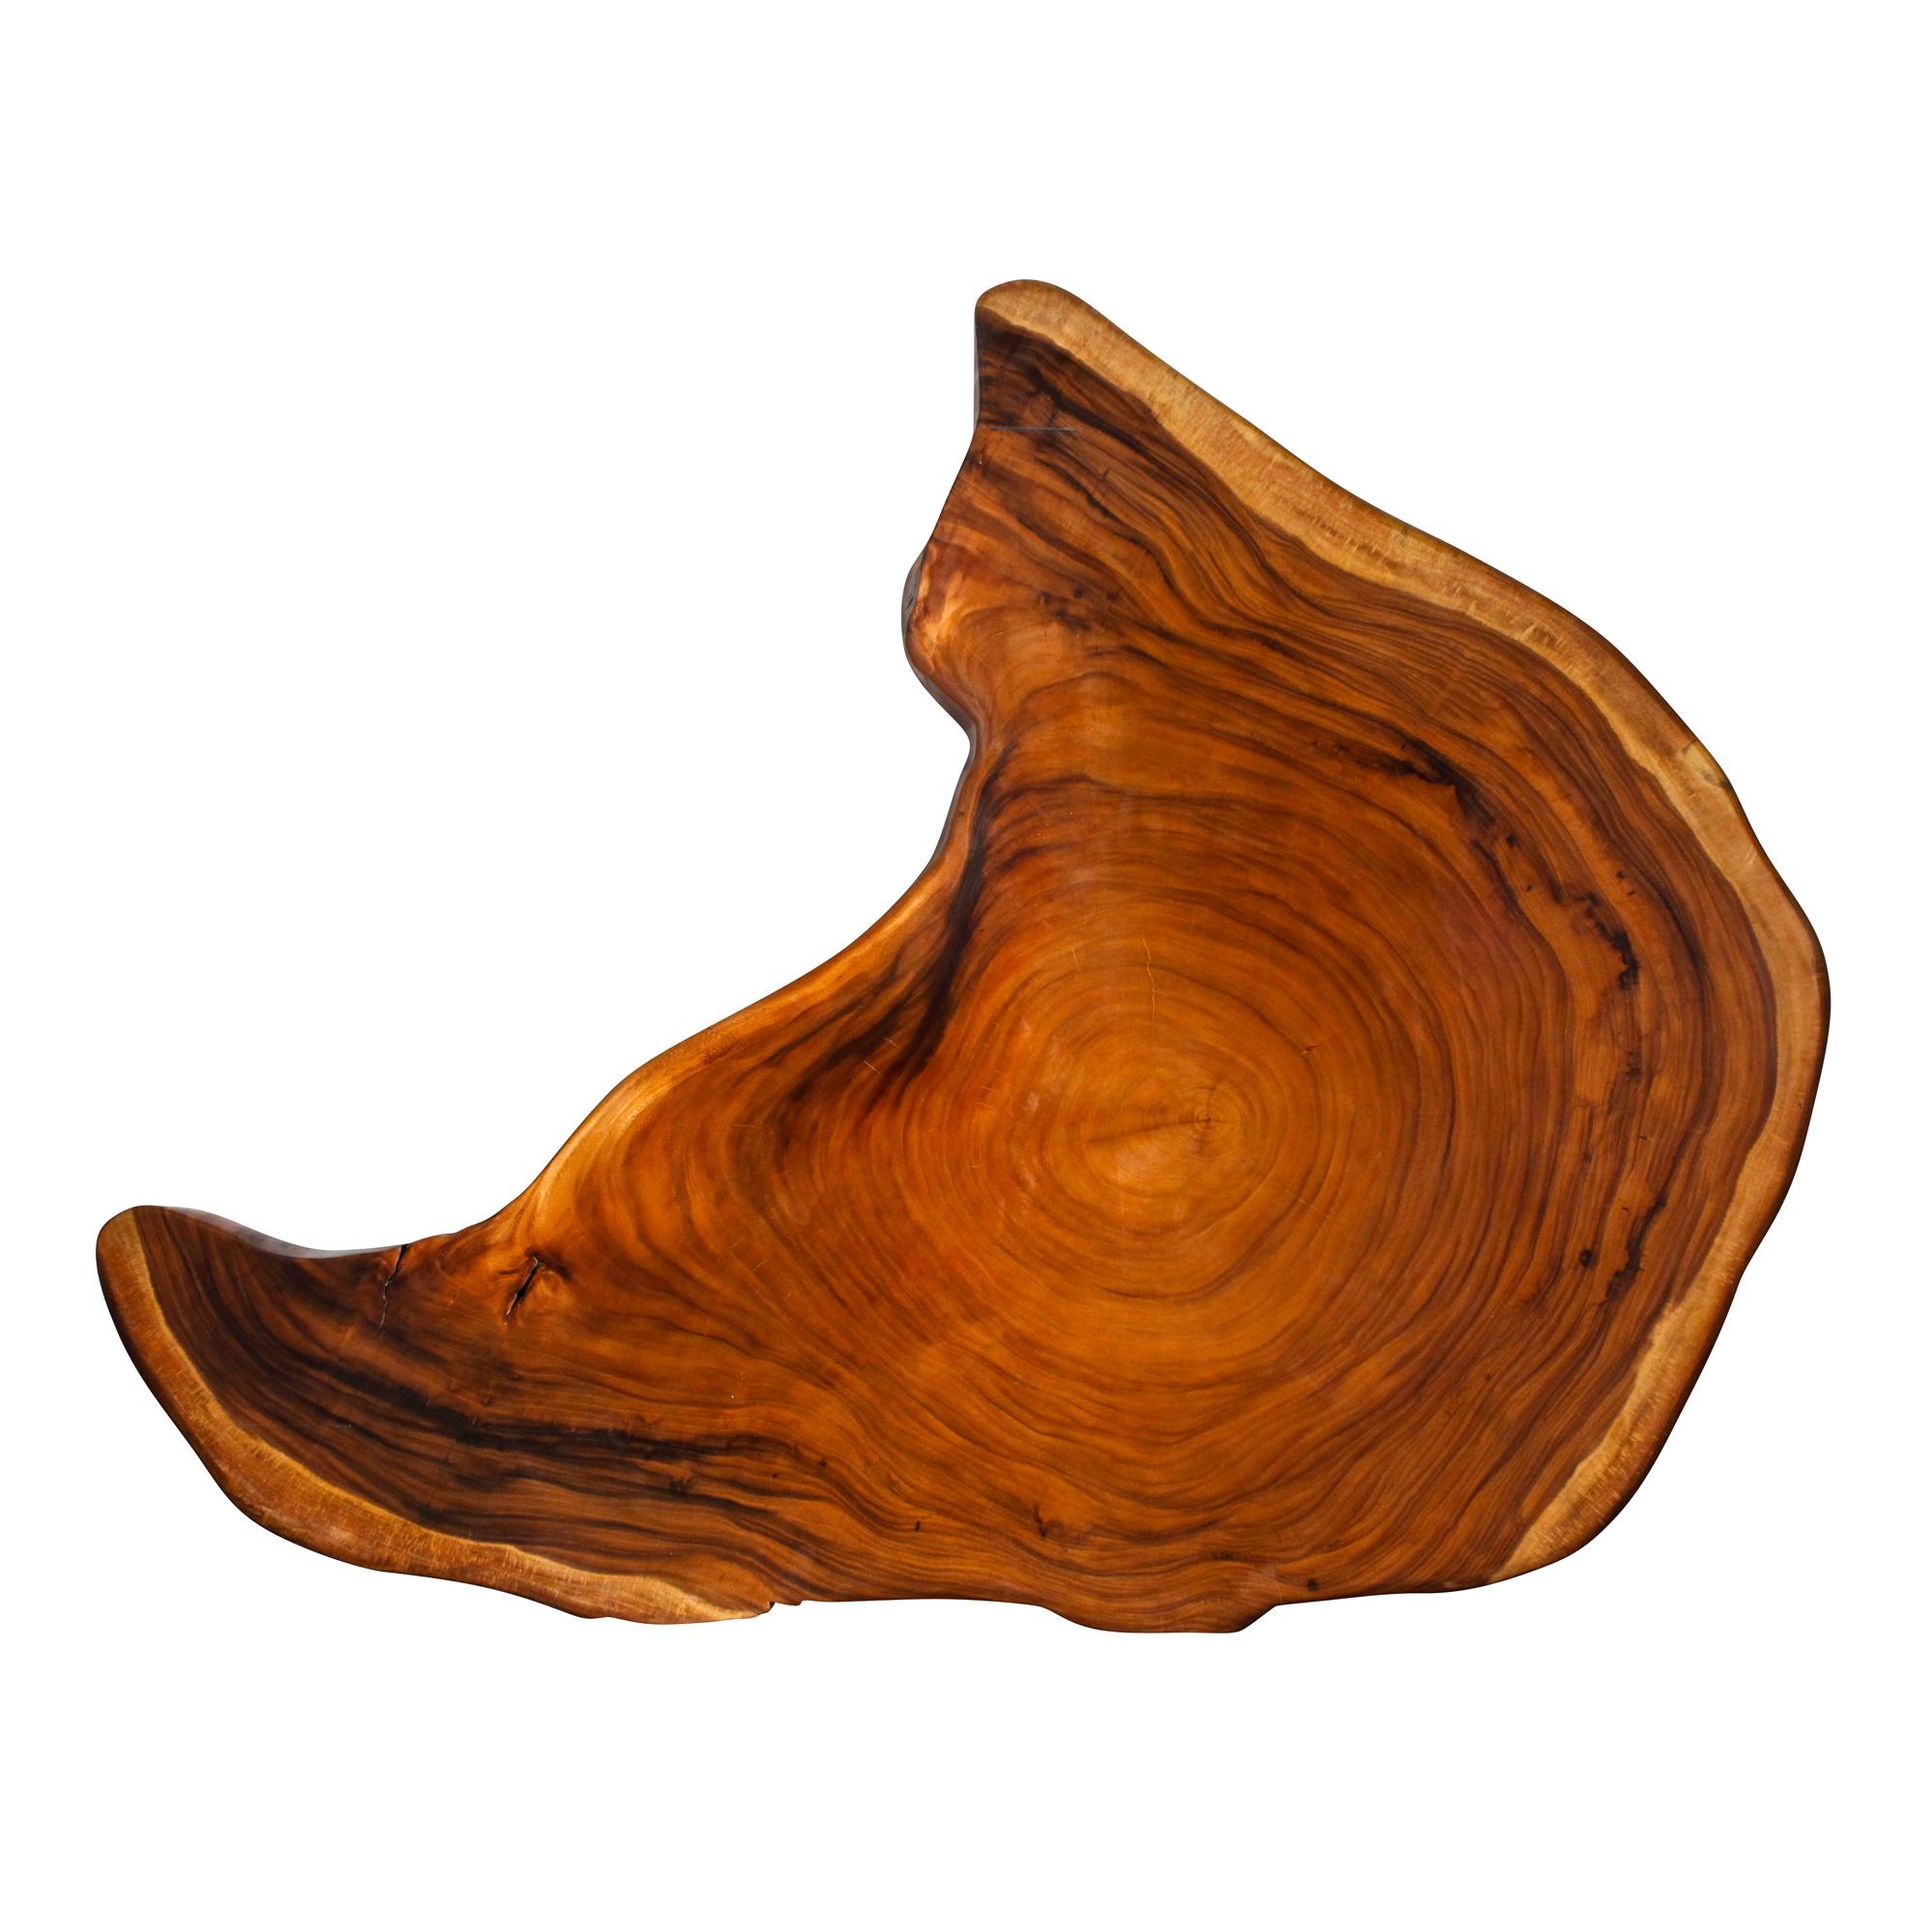 Saman Natural Wood Art - RH2